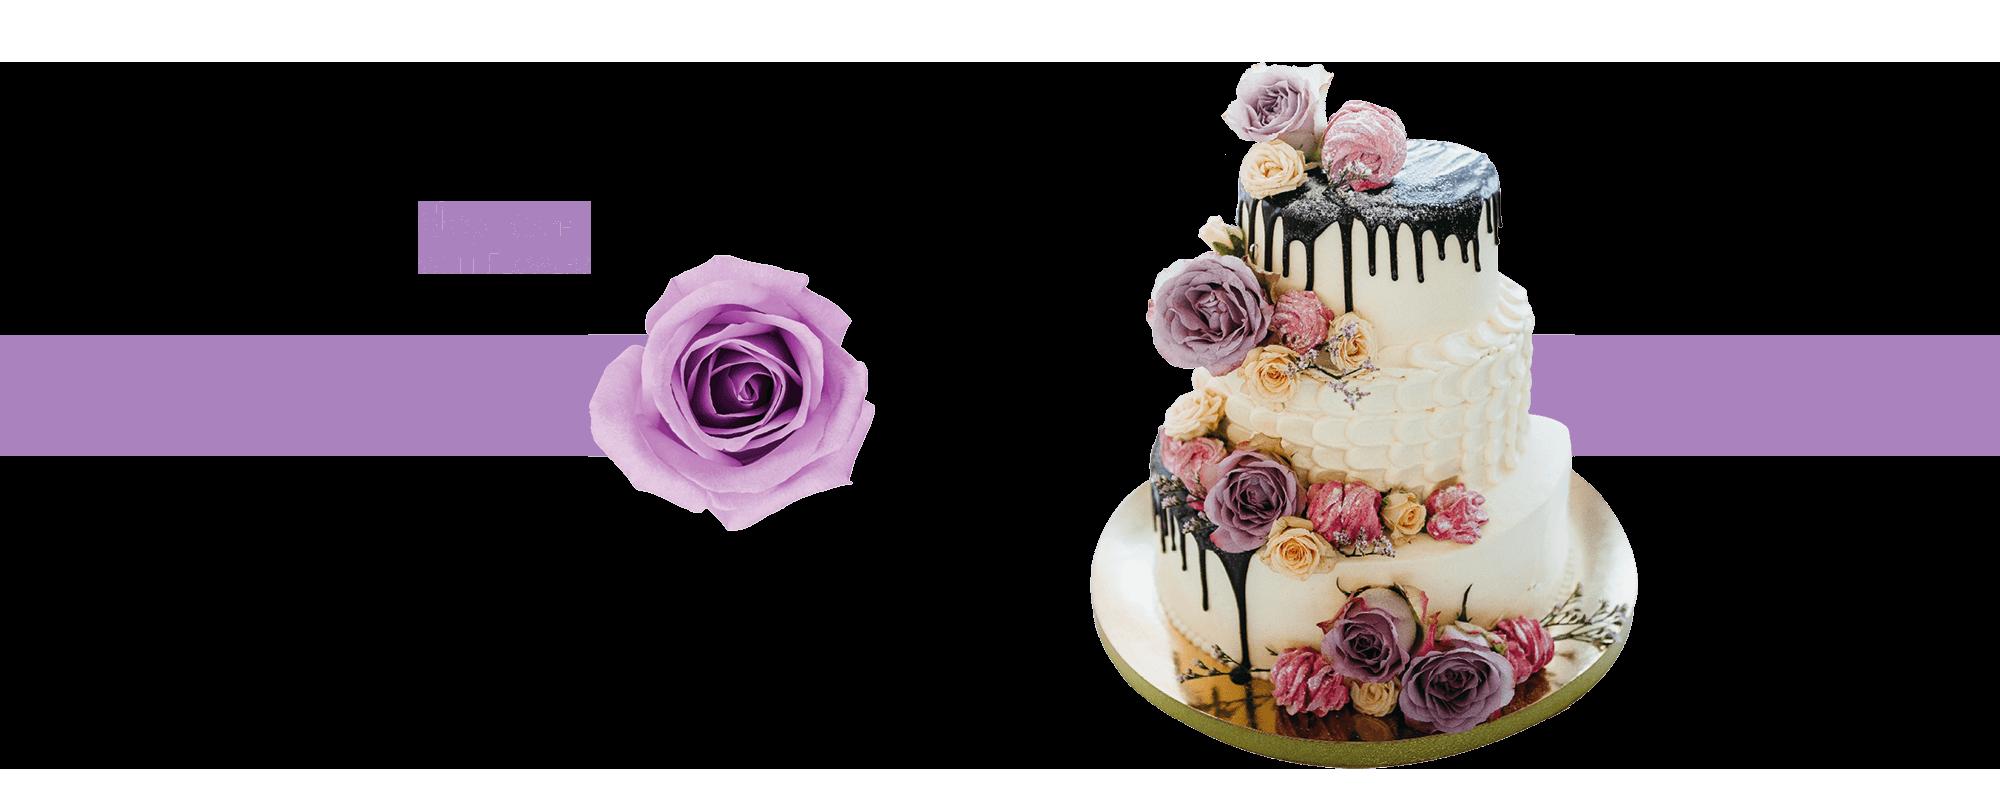 CAKE-DESIGN-DRIP-CAKE-WITH-FLOWERS